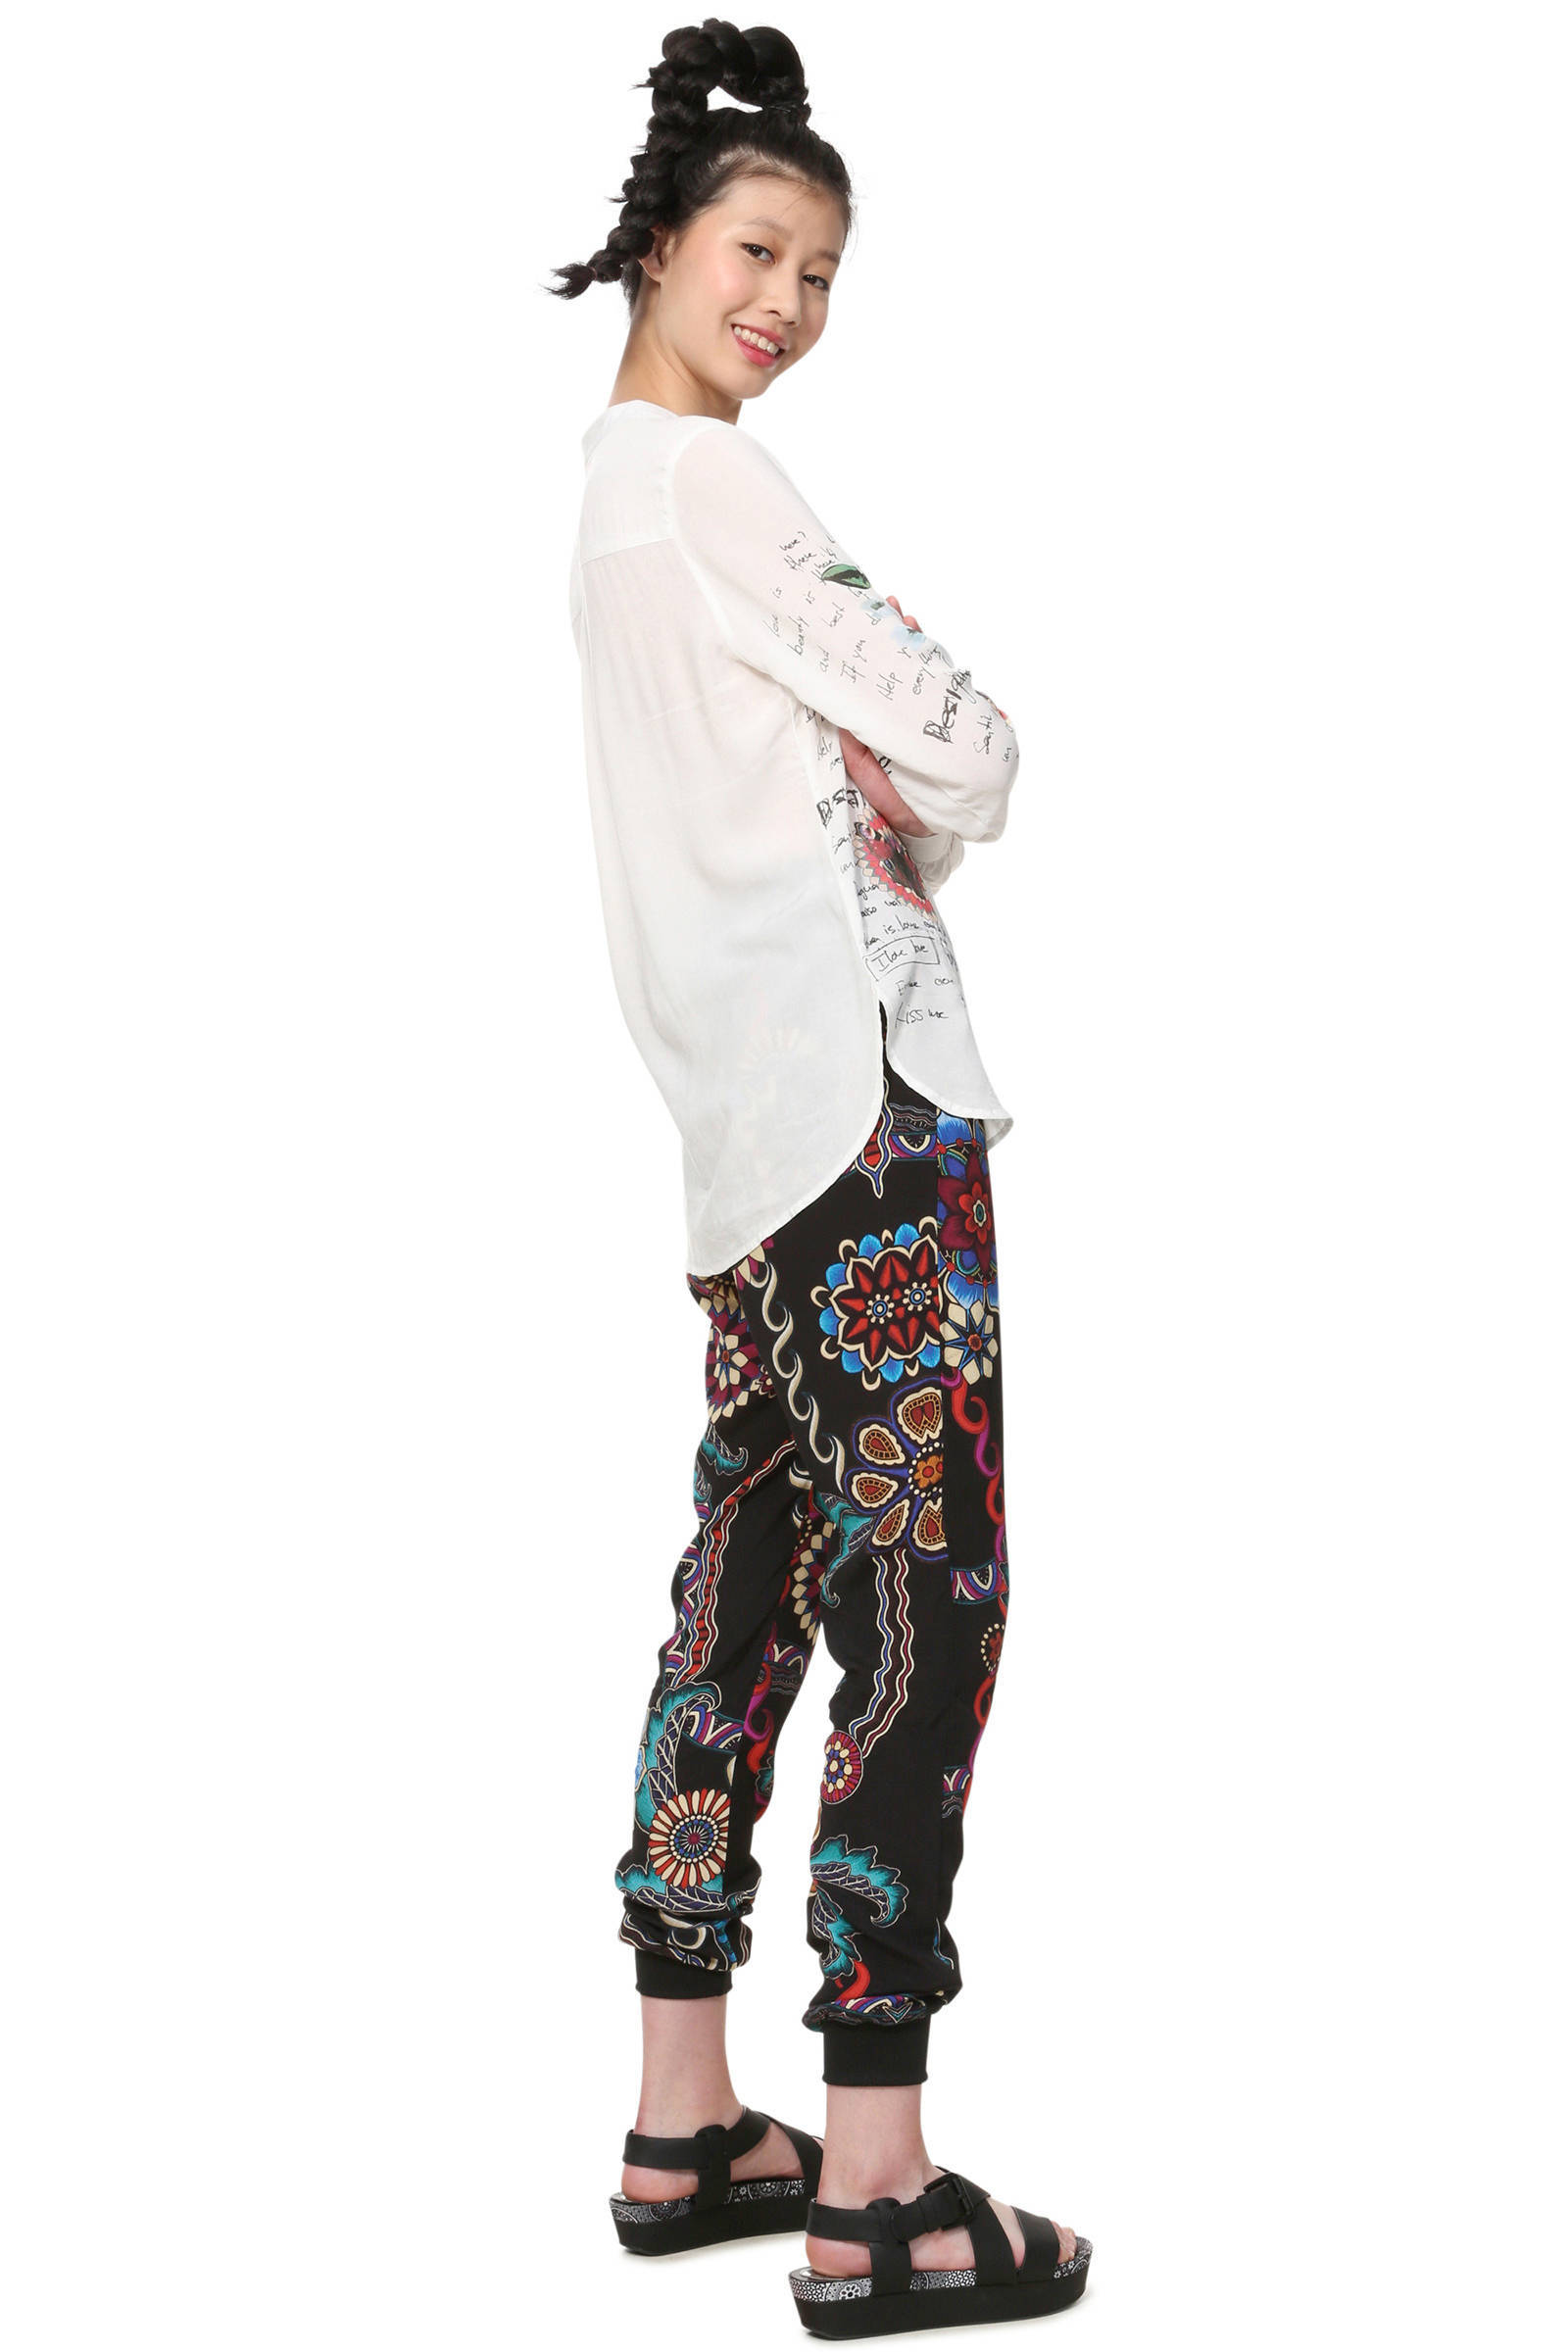 Desigual blouse met printopdruk met Desigual printopdruk Desigual blouse qw1narwt